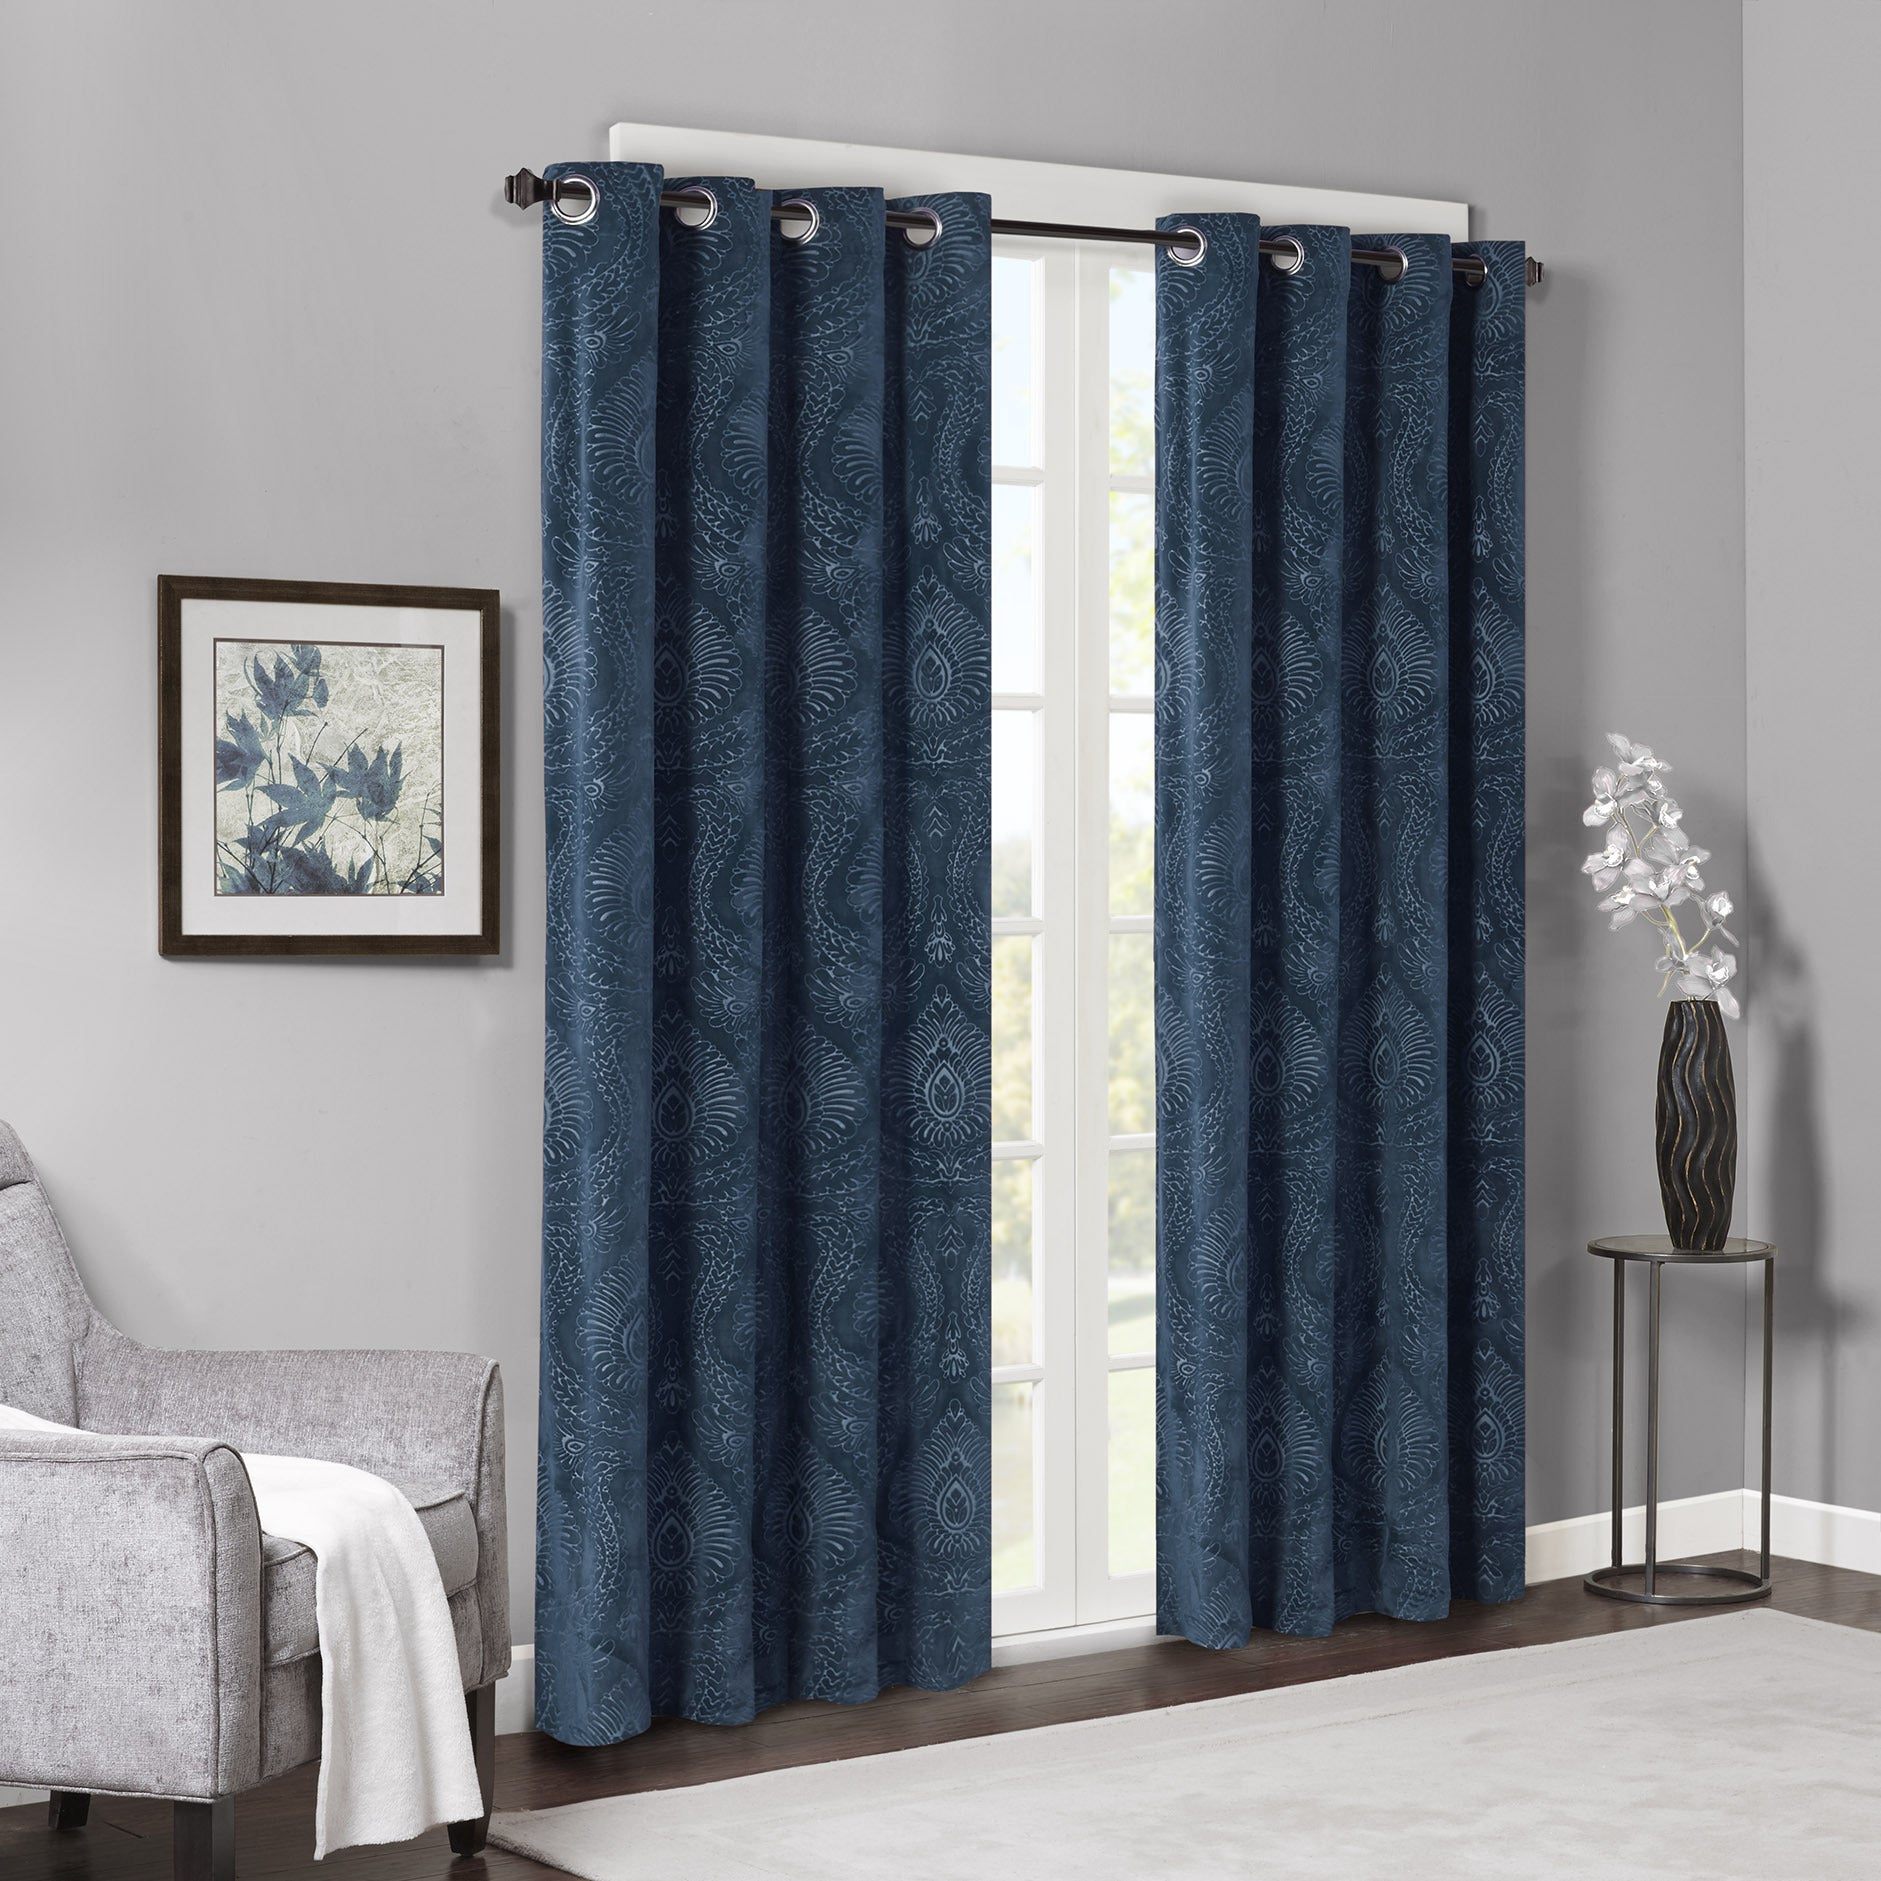 Shop Madison Park Cecil Embossed Damask Velvet Curtain Panel - On ...